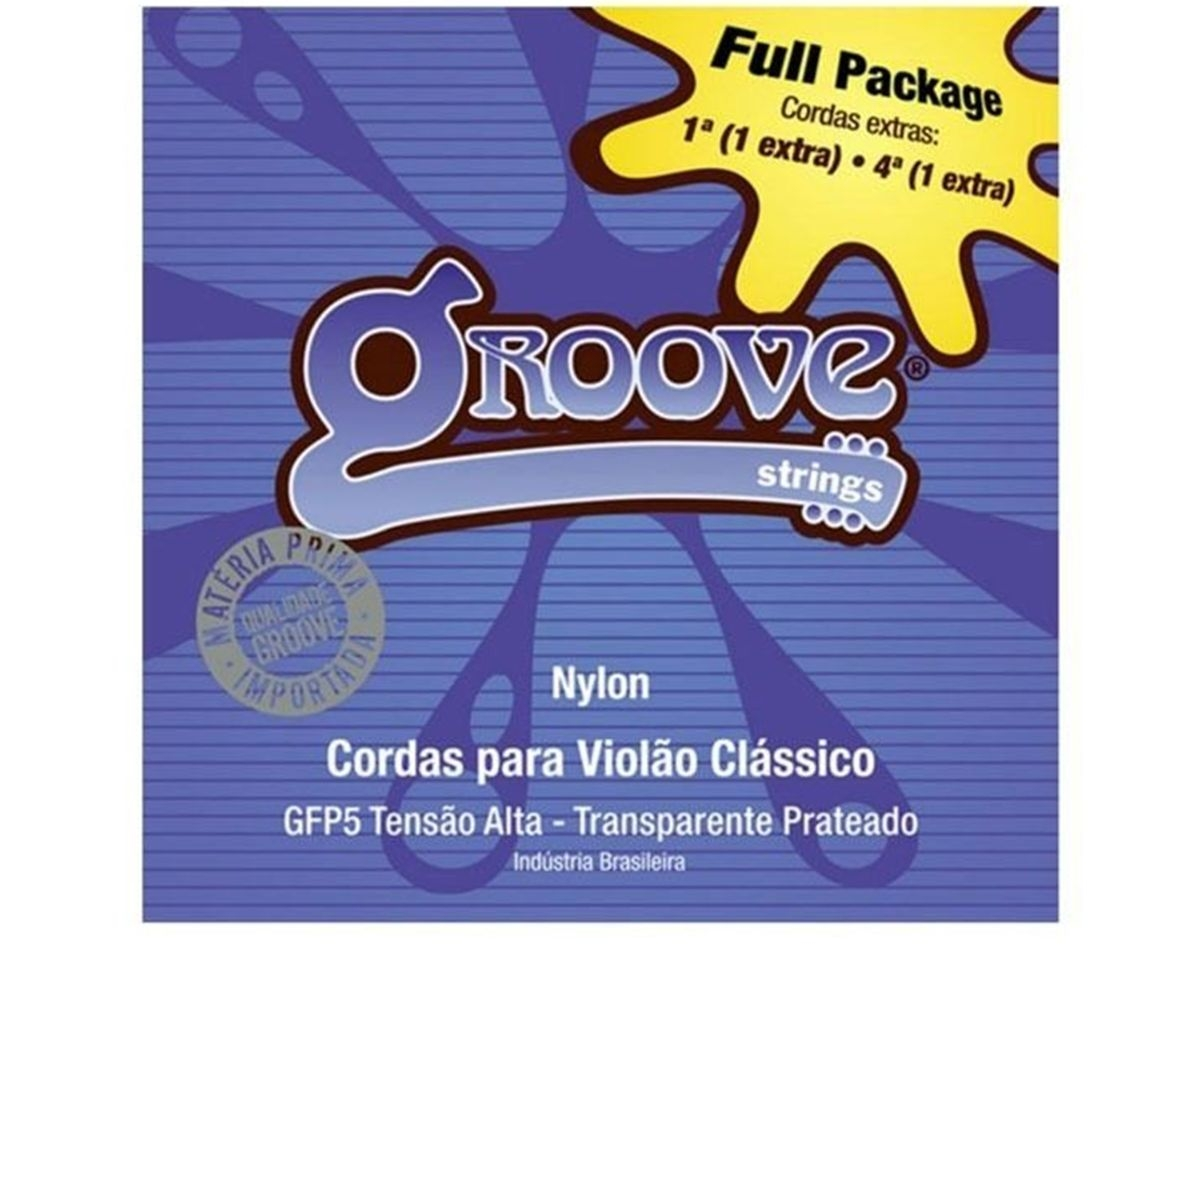 Encordoamento de Violão Nylon Groove